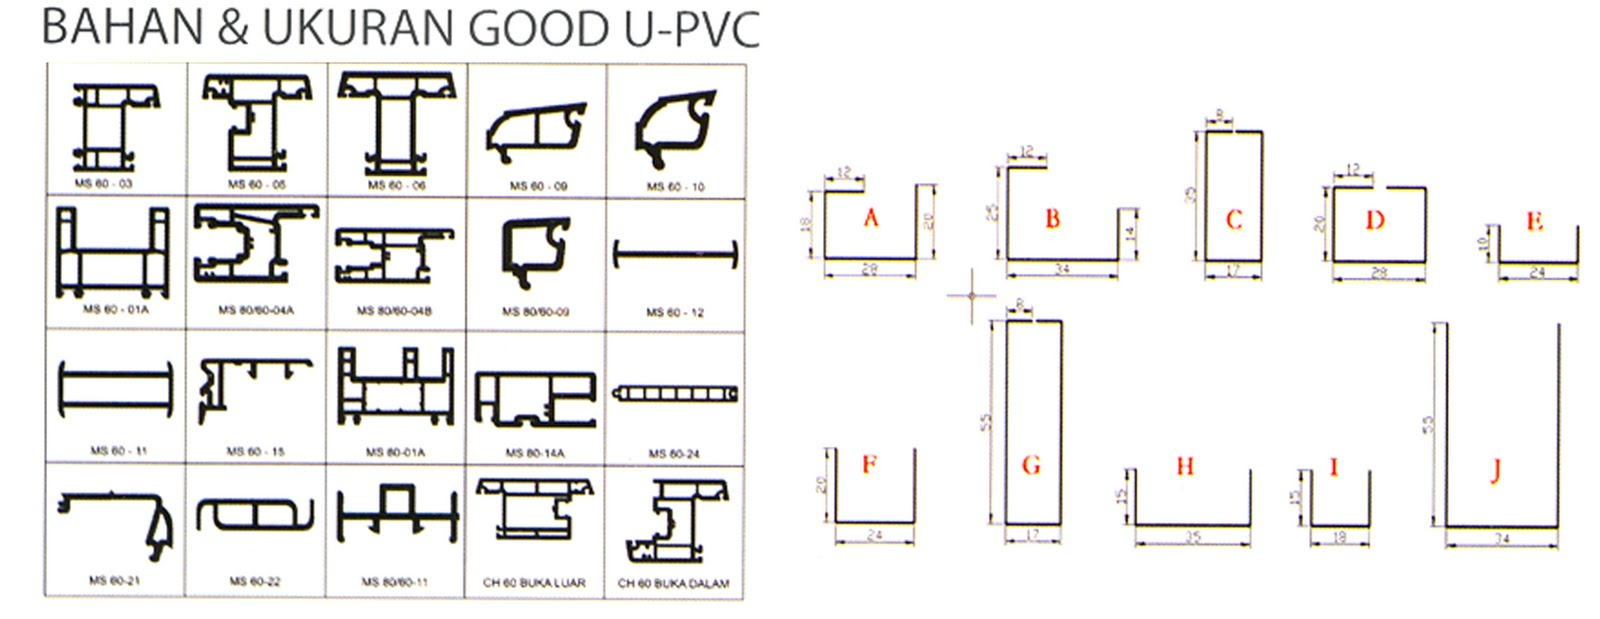 bhn+ukuran+good+upvc.jpg